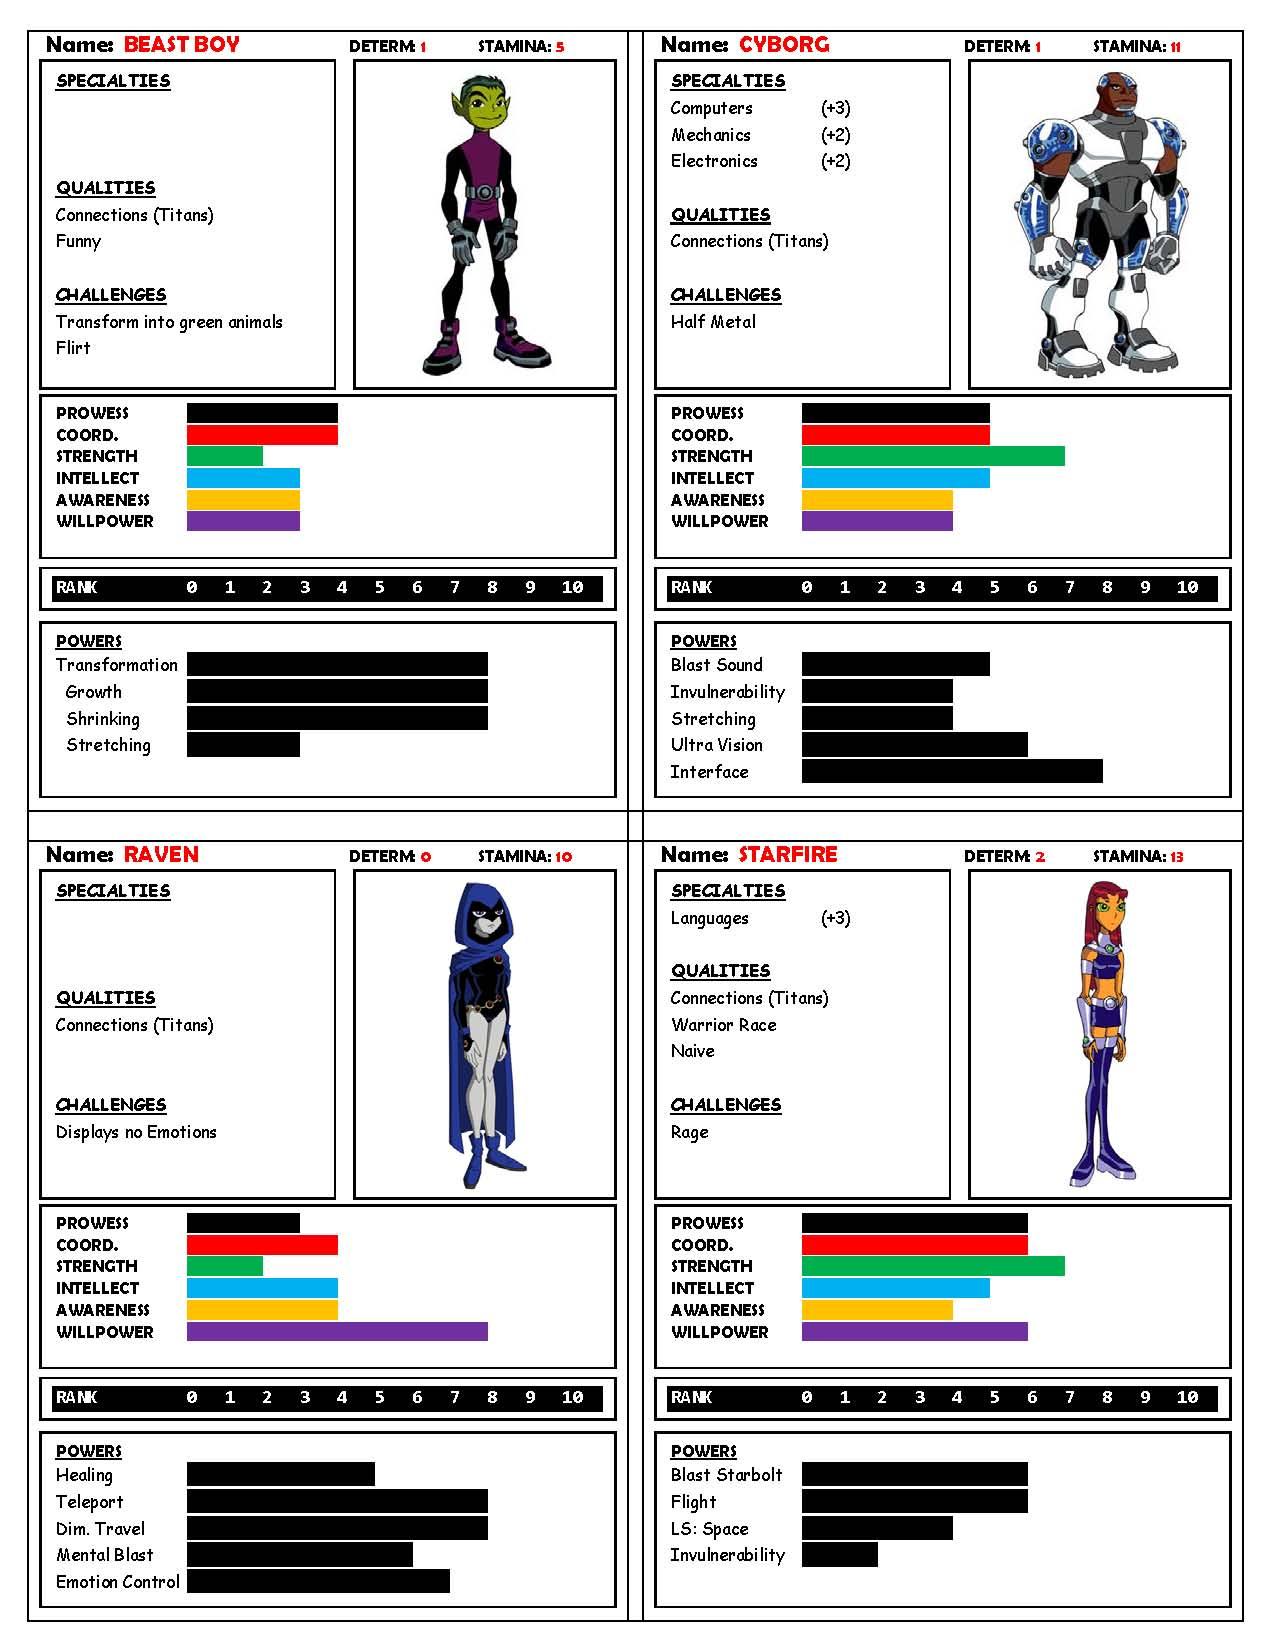 Titans_01.jpg